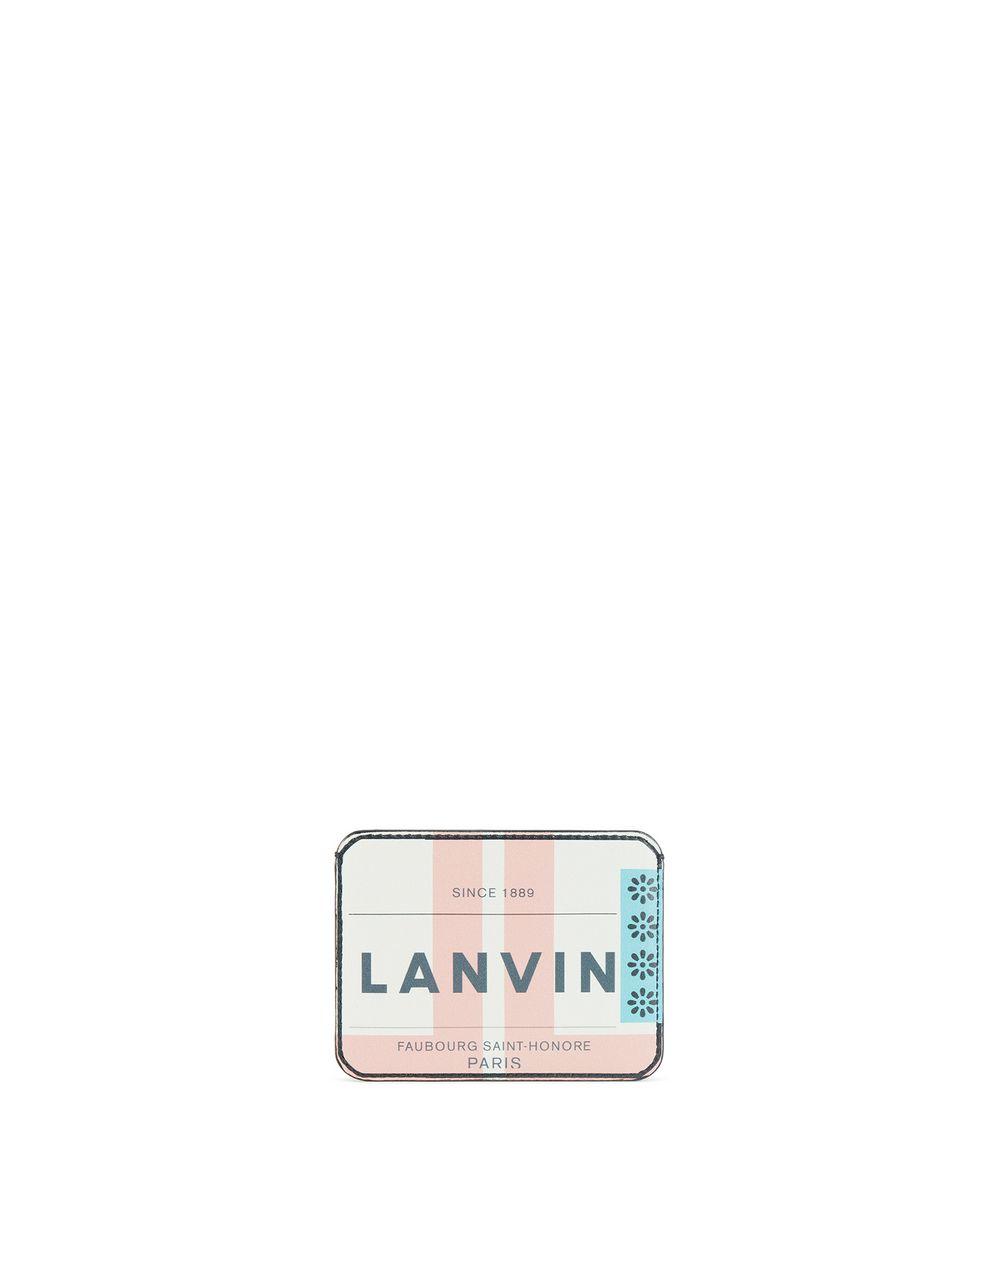 LANVIN-PRINT CARD HOLDER - Lanvin